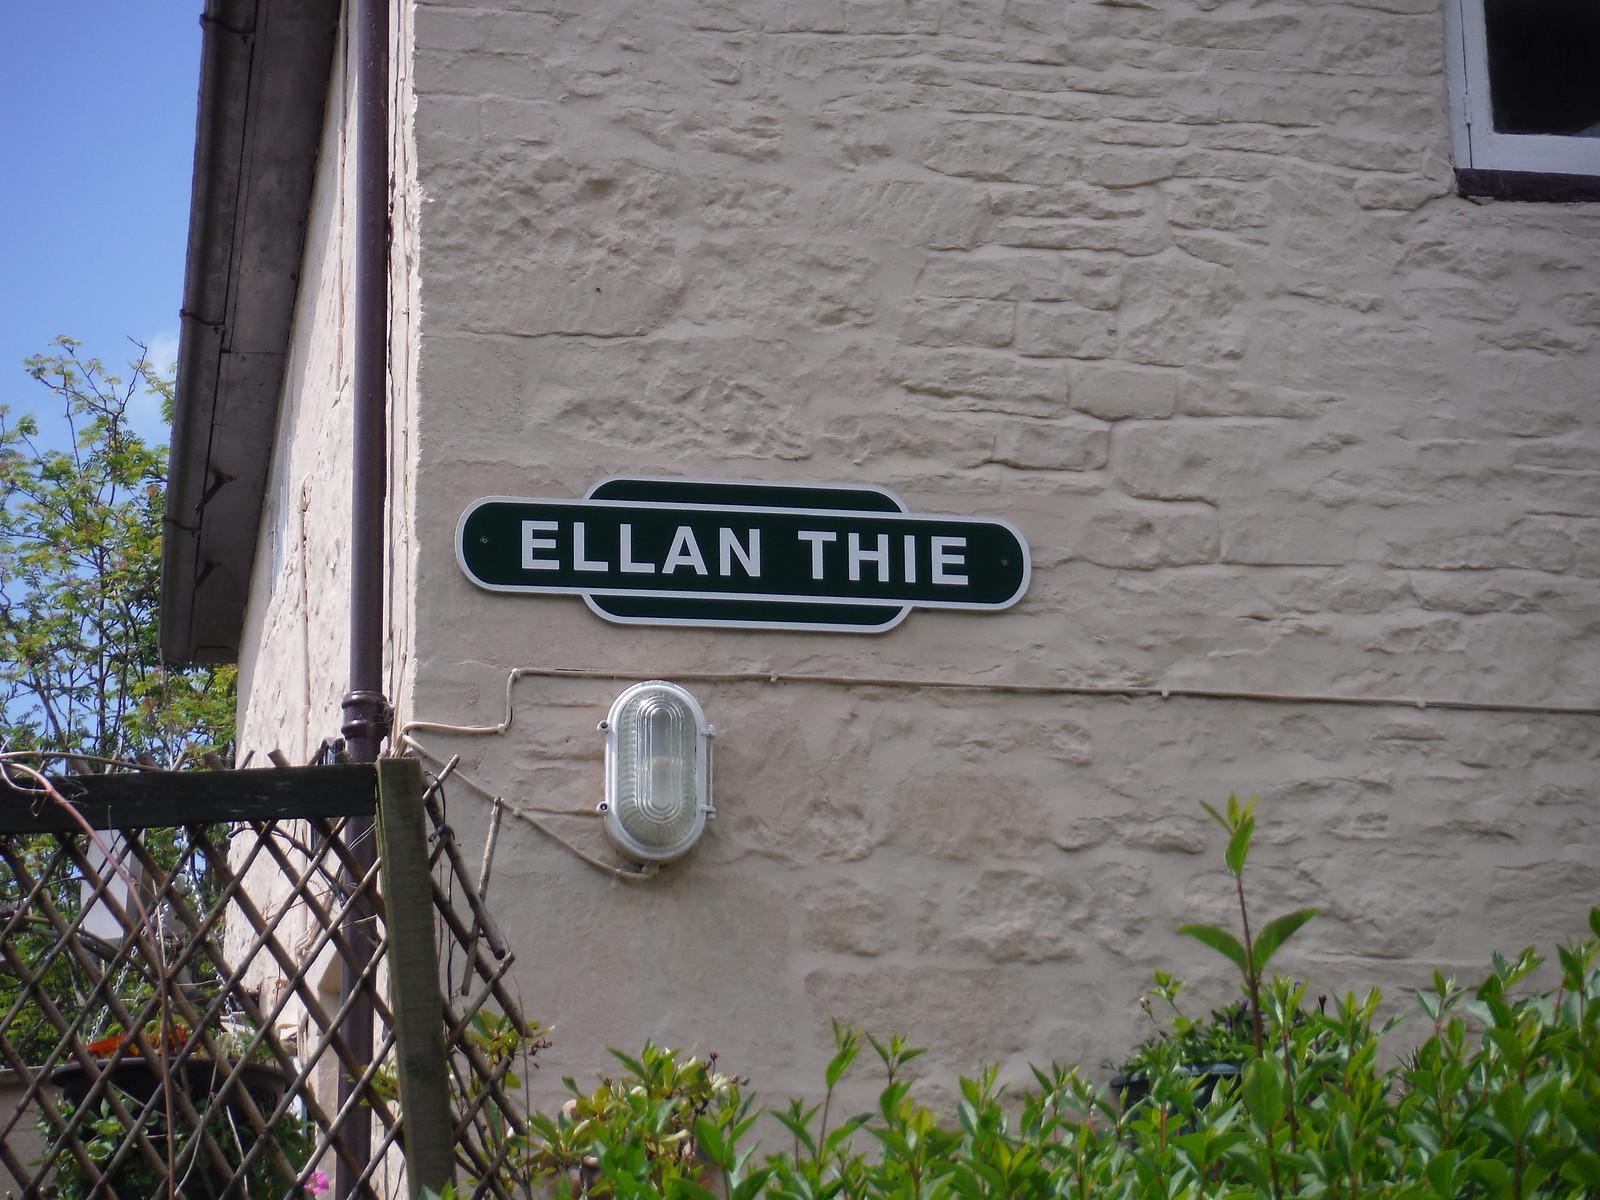 Ellan Thie SWC Walk 249 Tisbury Circular via Dinton and Fovant